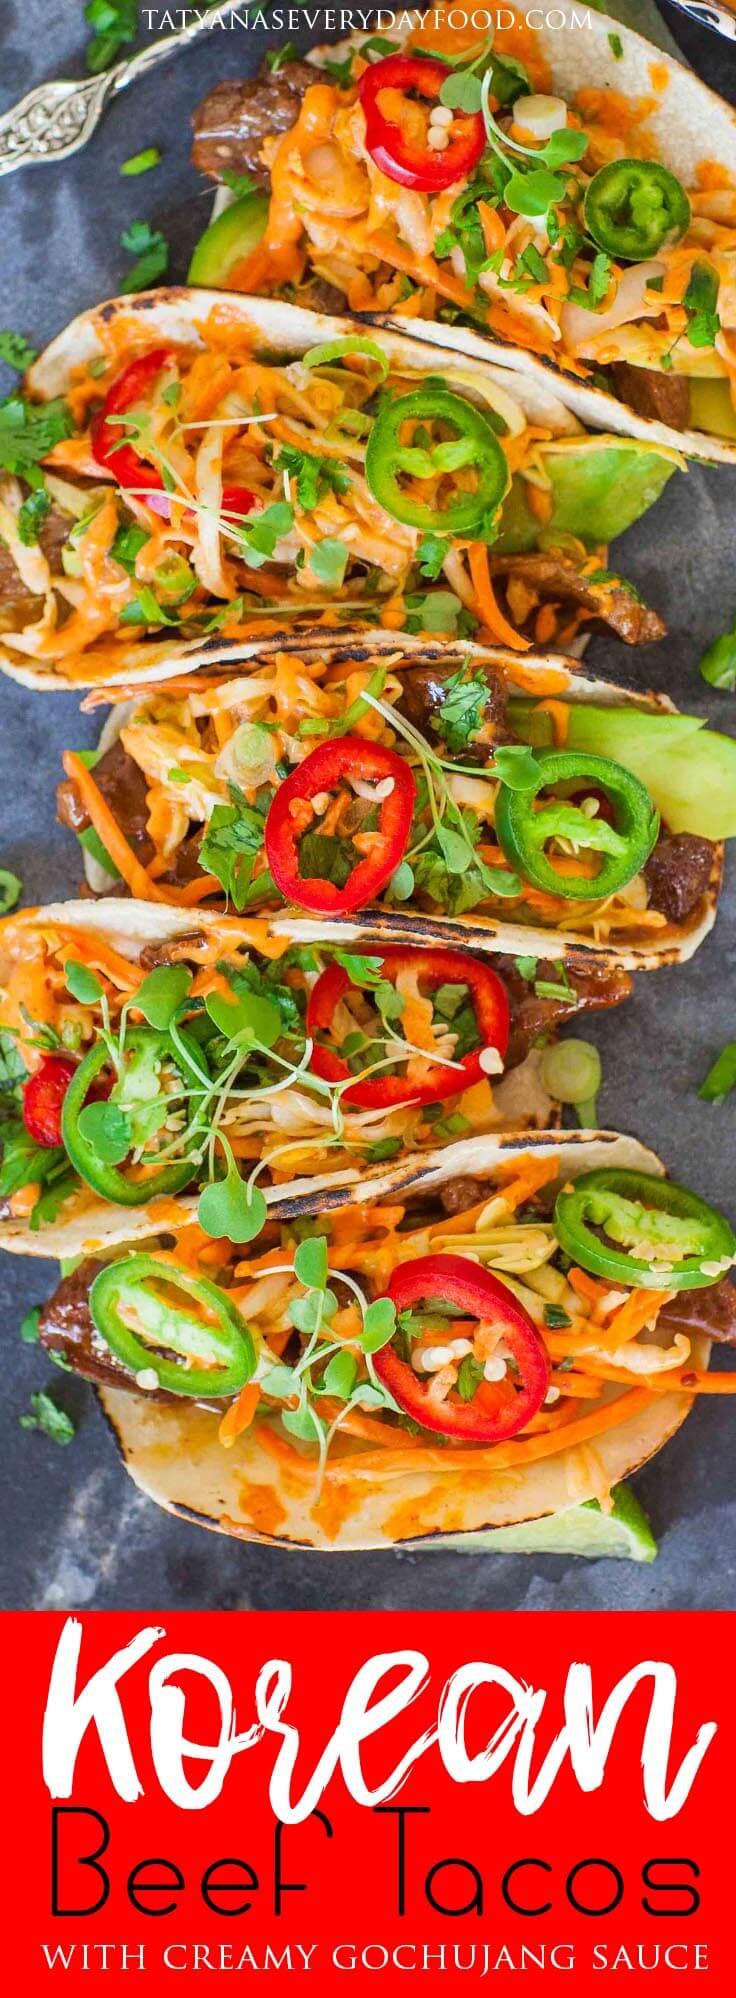 Korean Beef Tacos video recipe